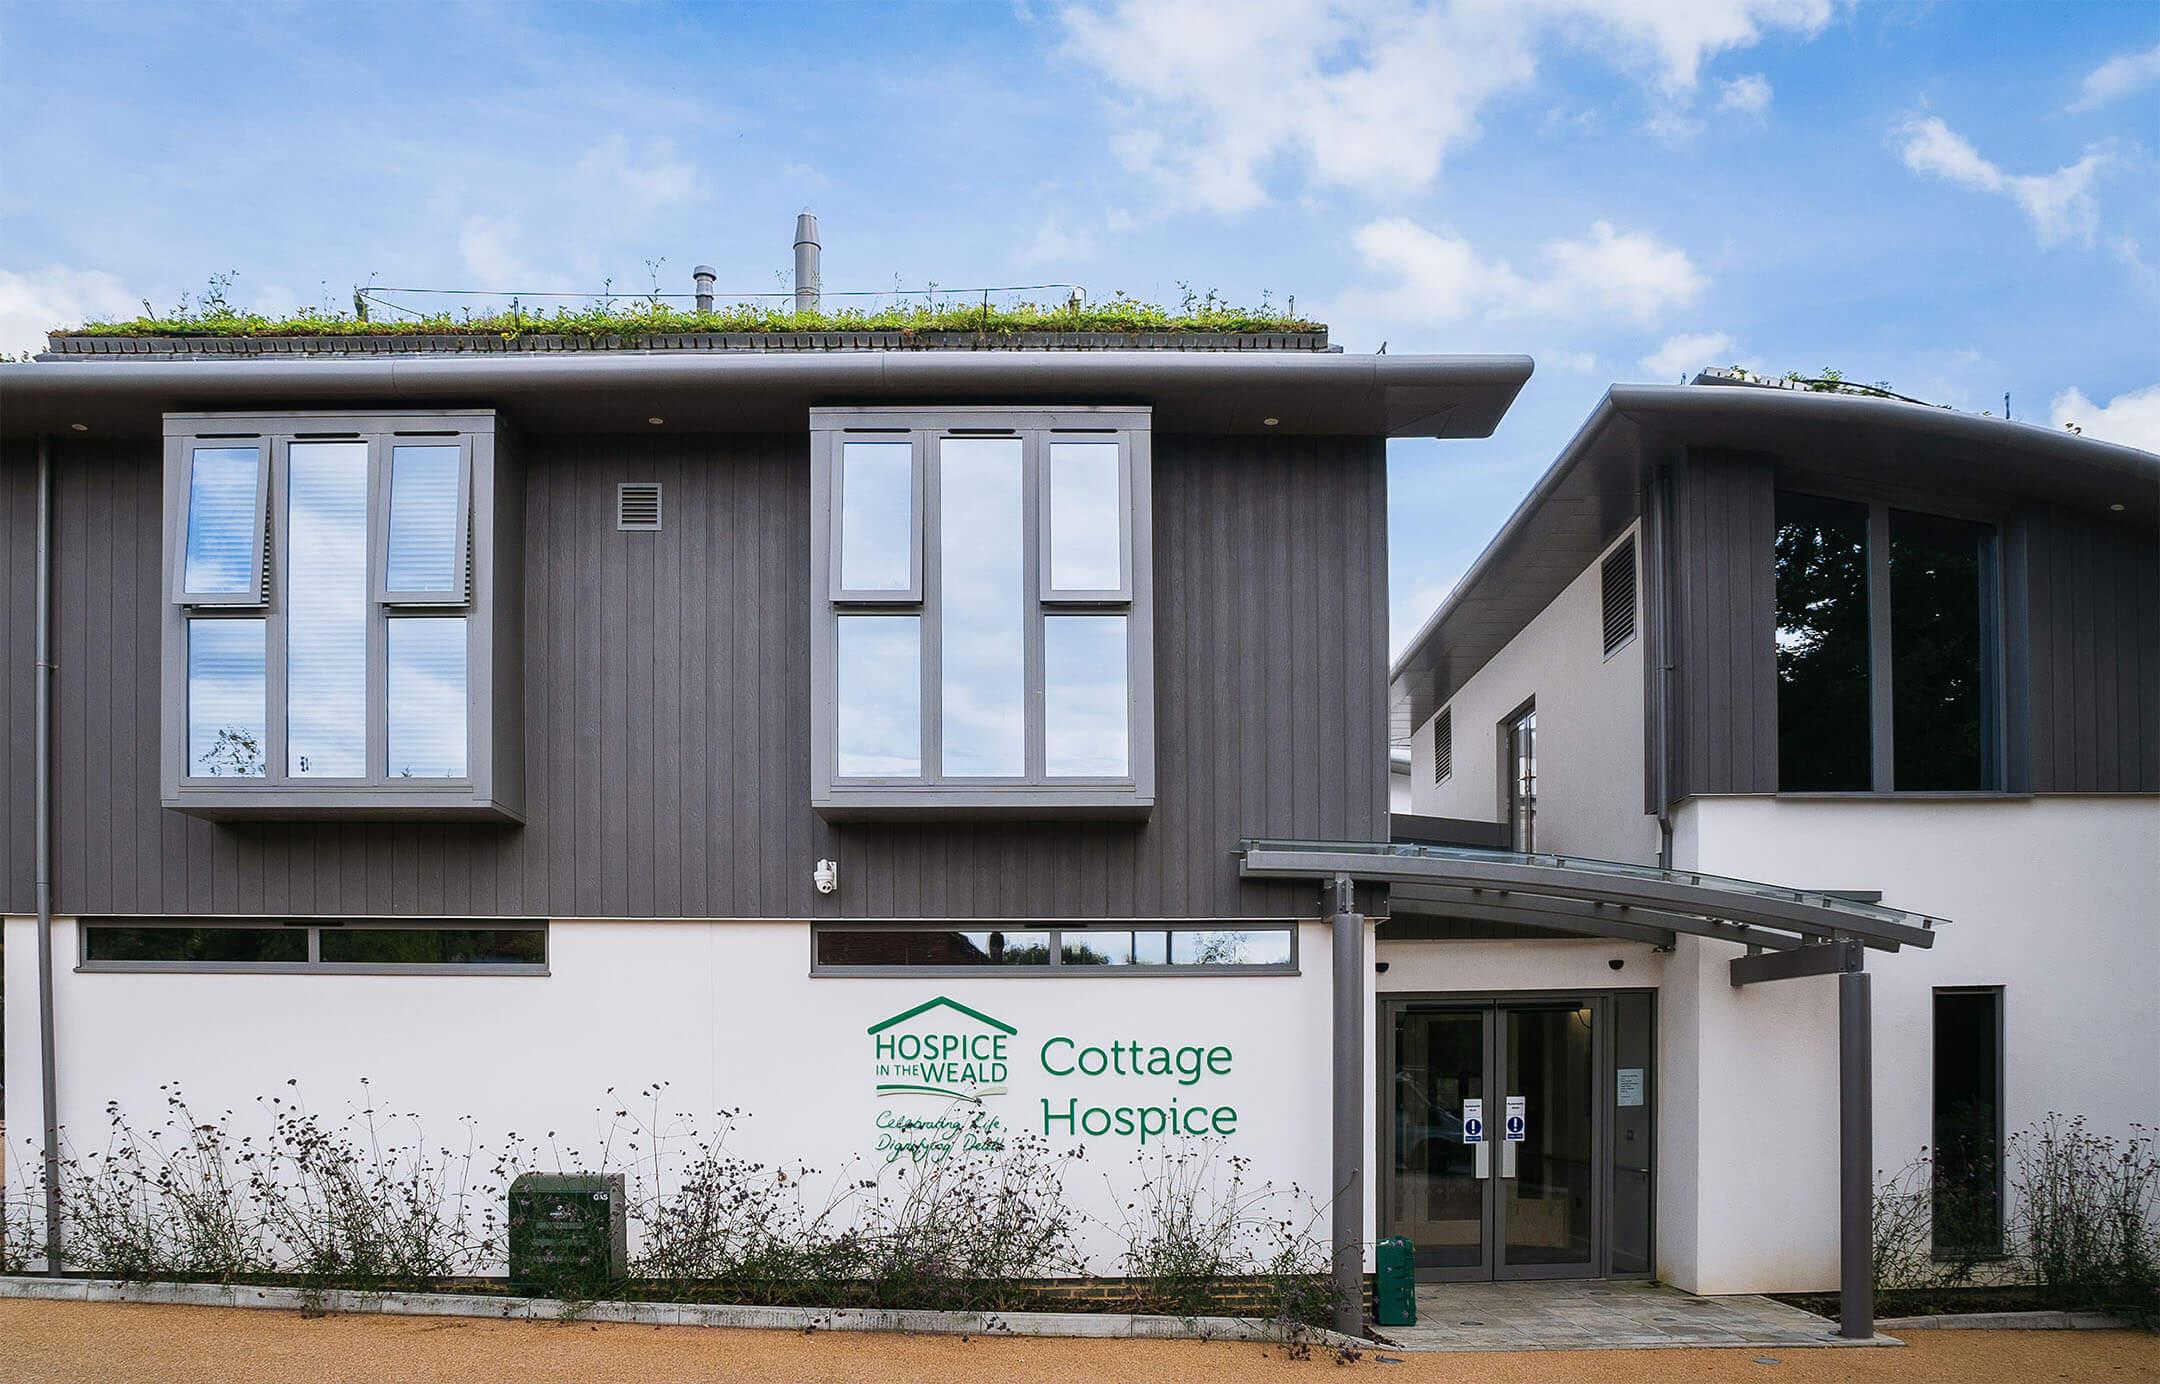 Cottage Hospice building exterior